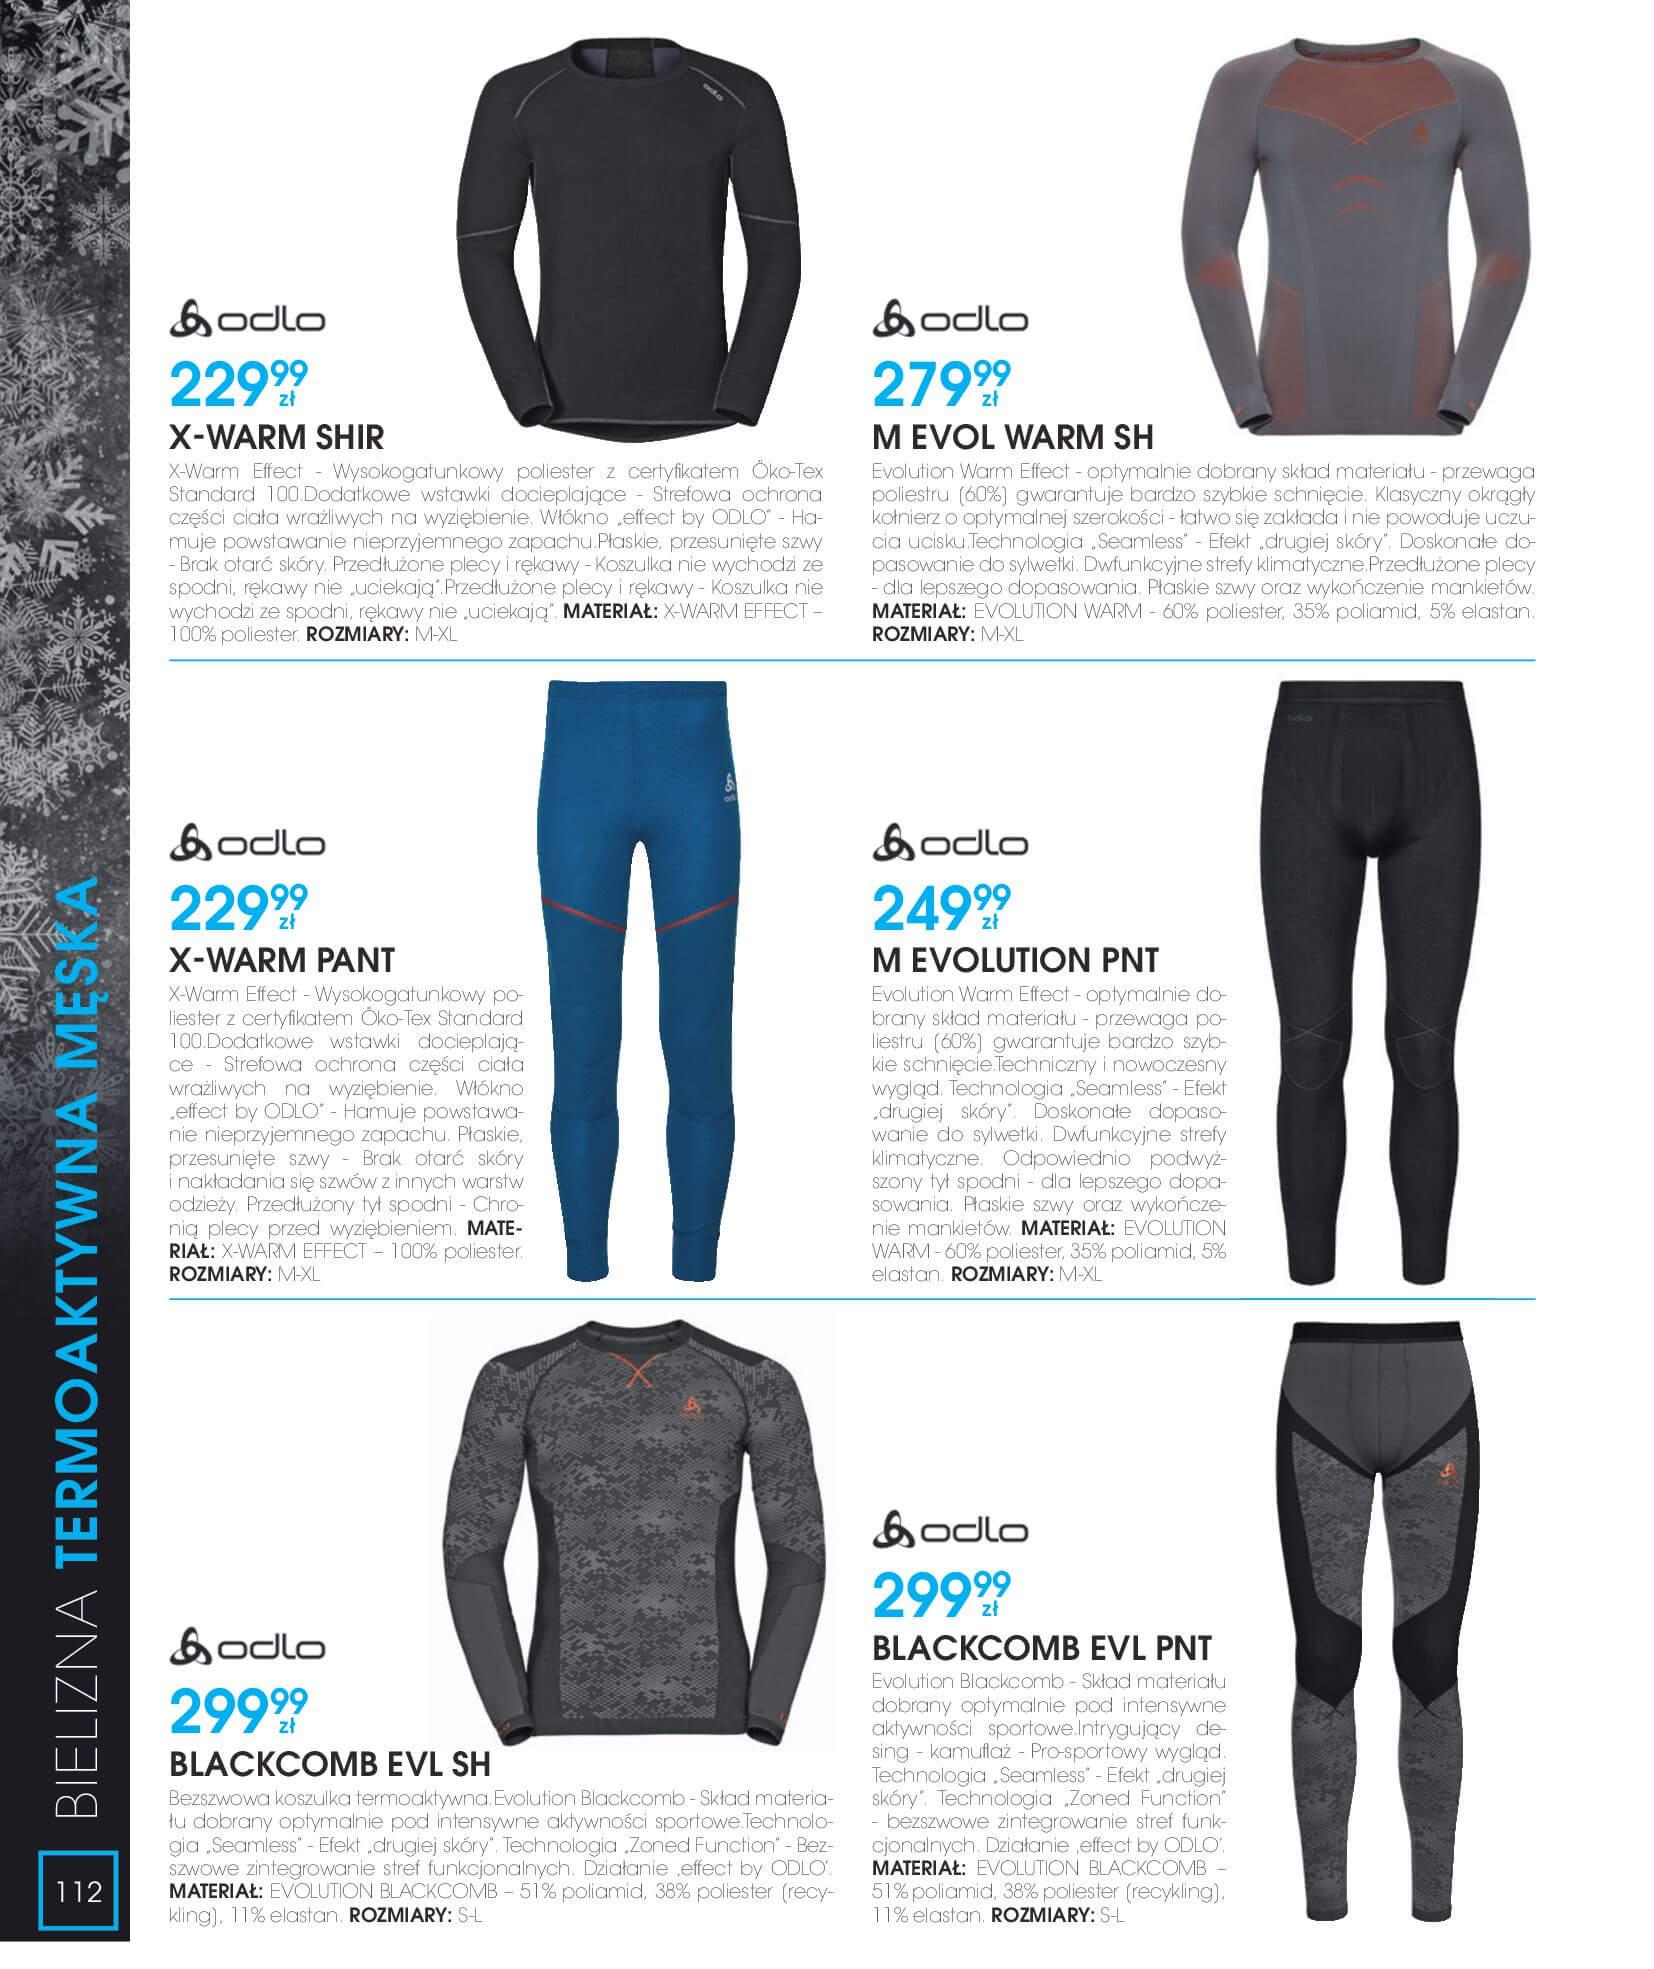 Gazetka Go Sport - Katalog Zima 2017/2018-12.11.2017-28.02.2018-page-112